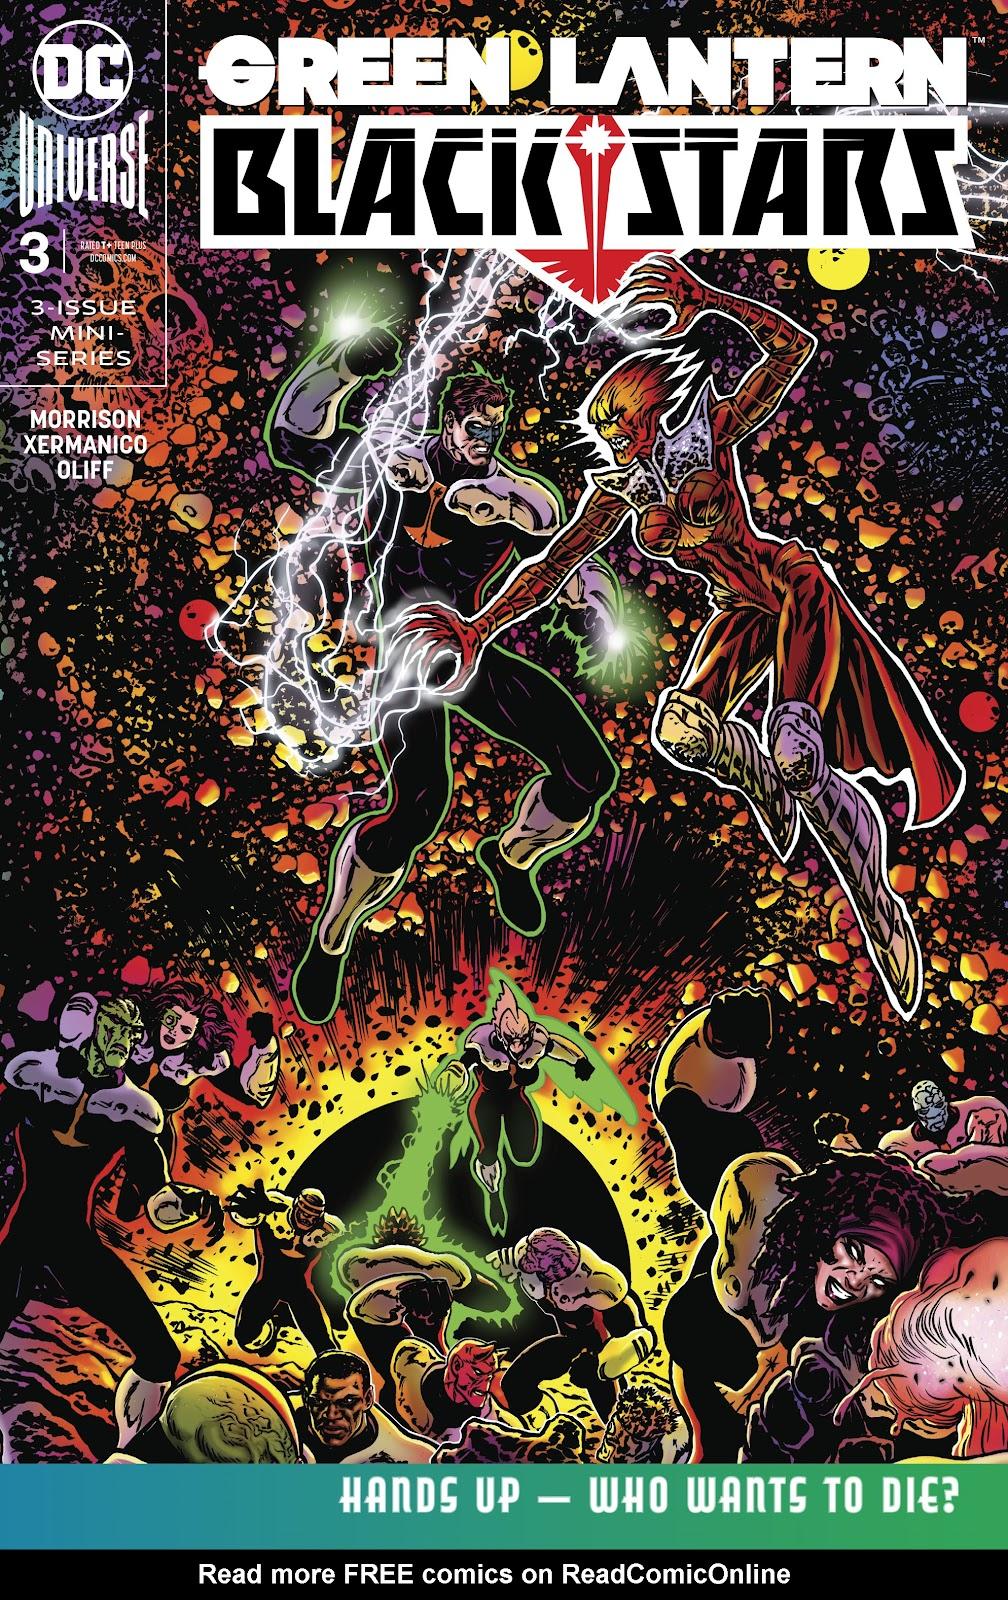 Green Lantern: Blackstars 3 Page 1